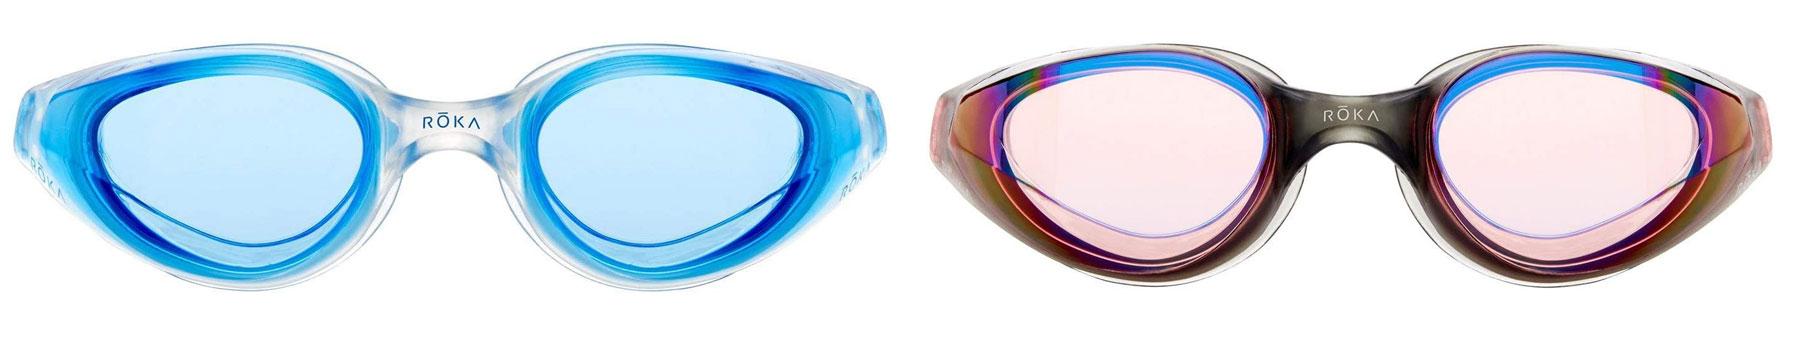 roka r1 anti-fog swim goggles